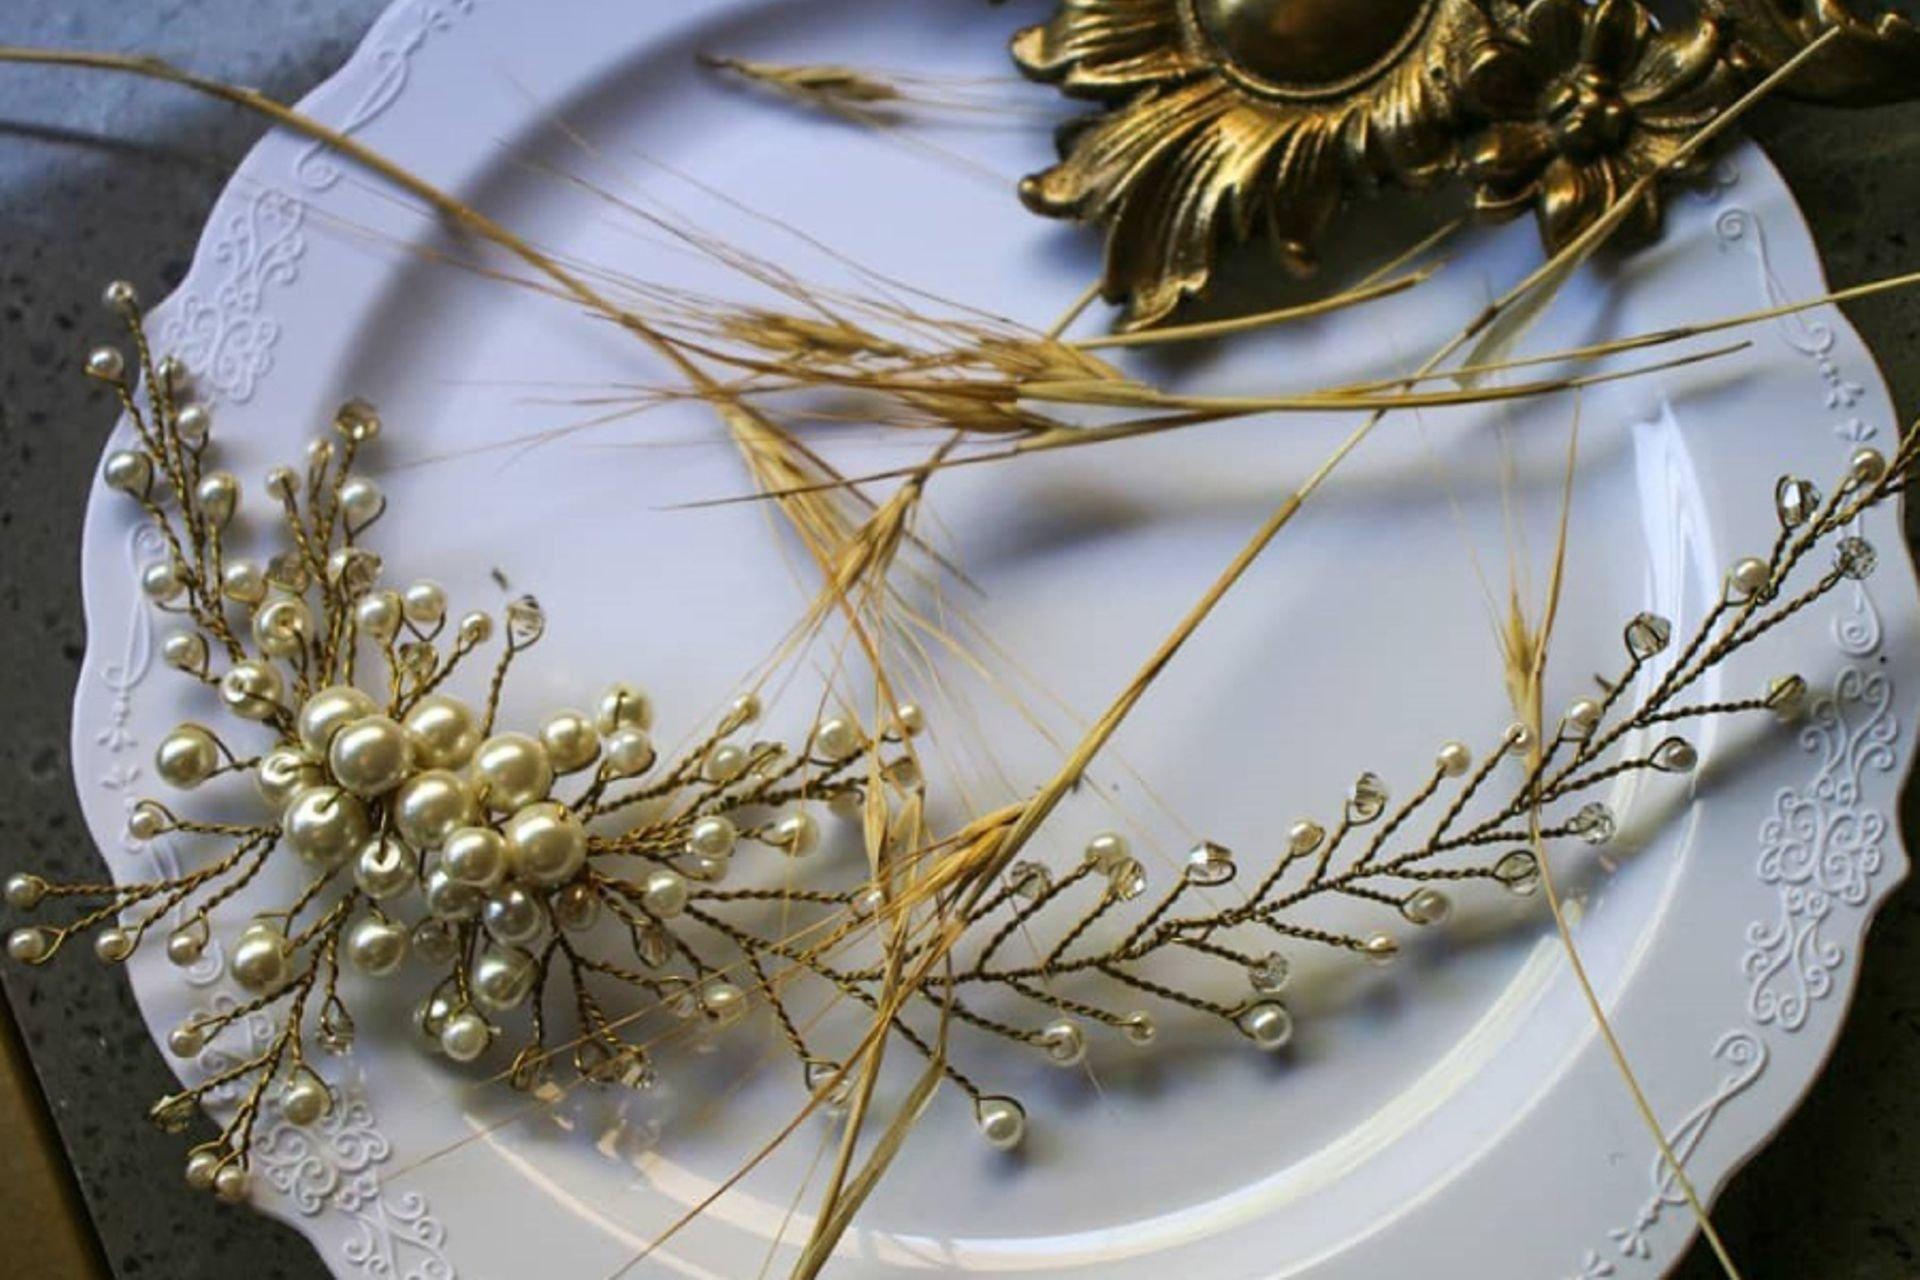 41 lantana beads jewelry designer תְמוּנָה